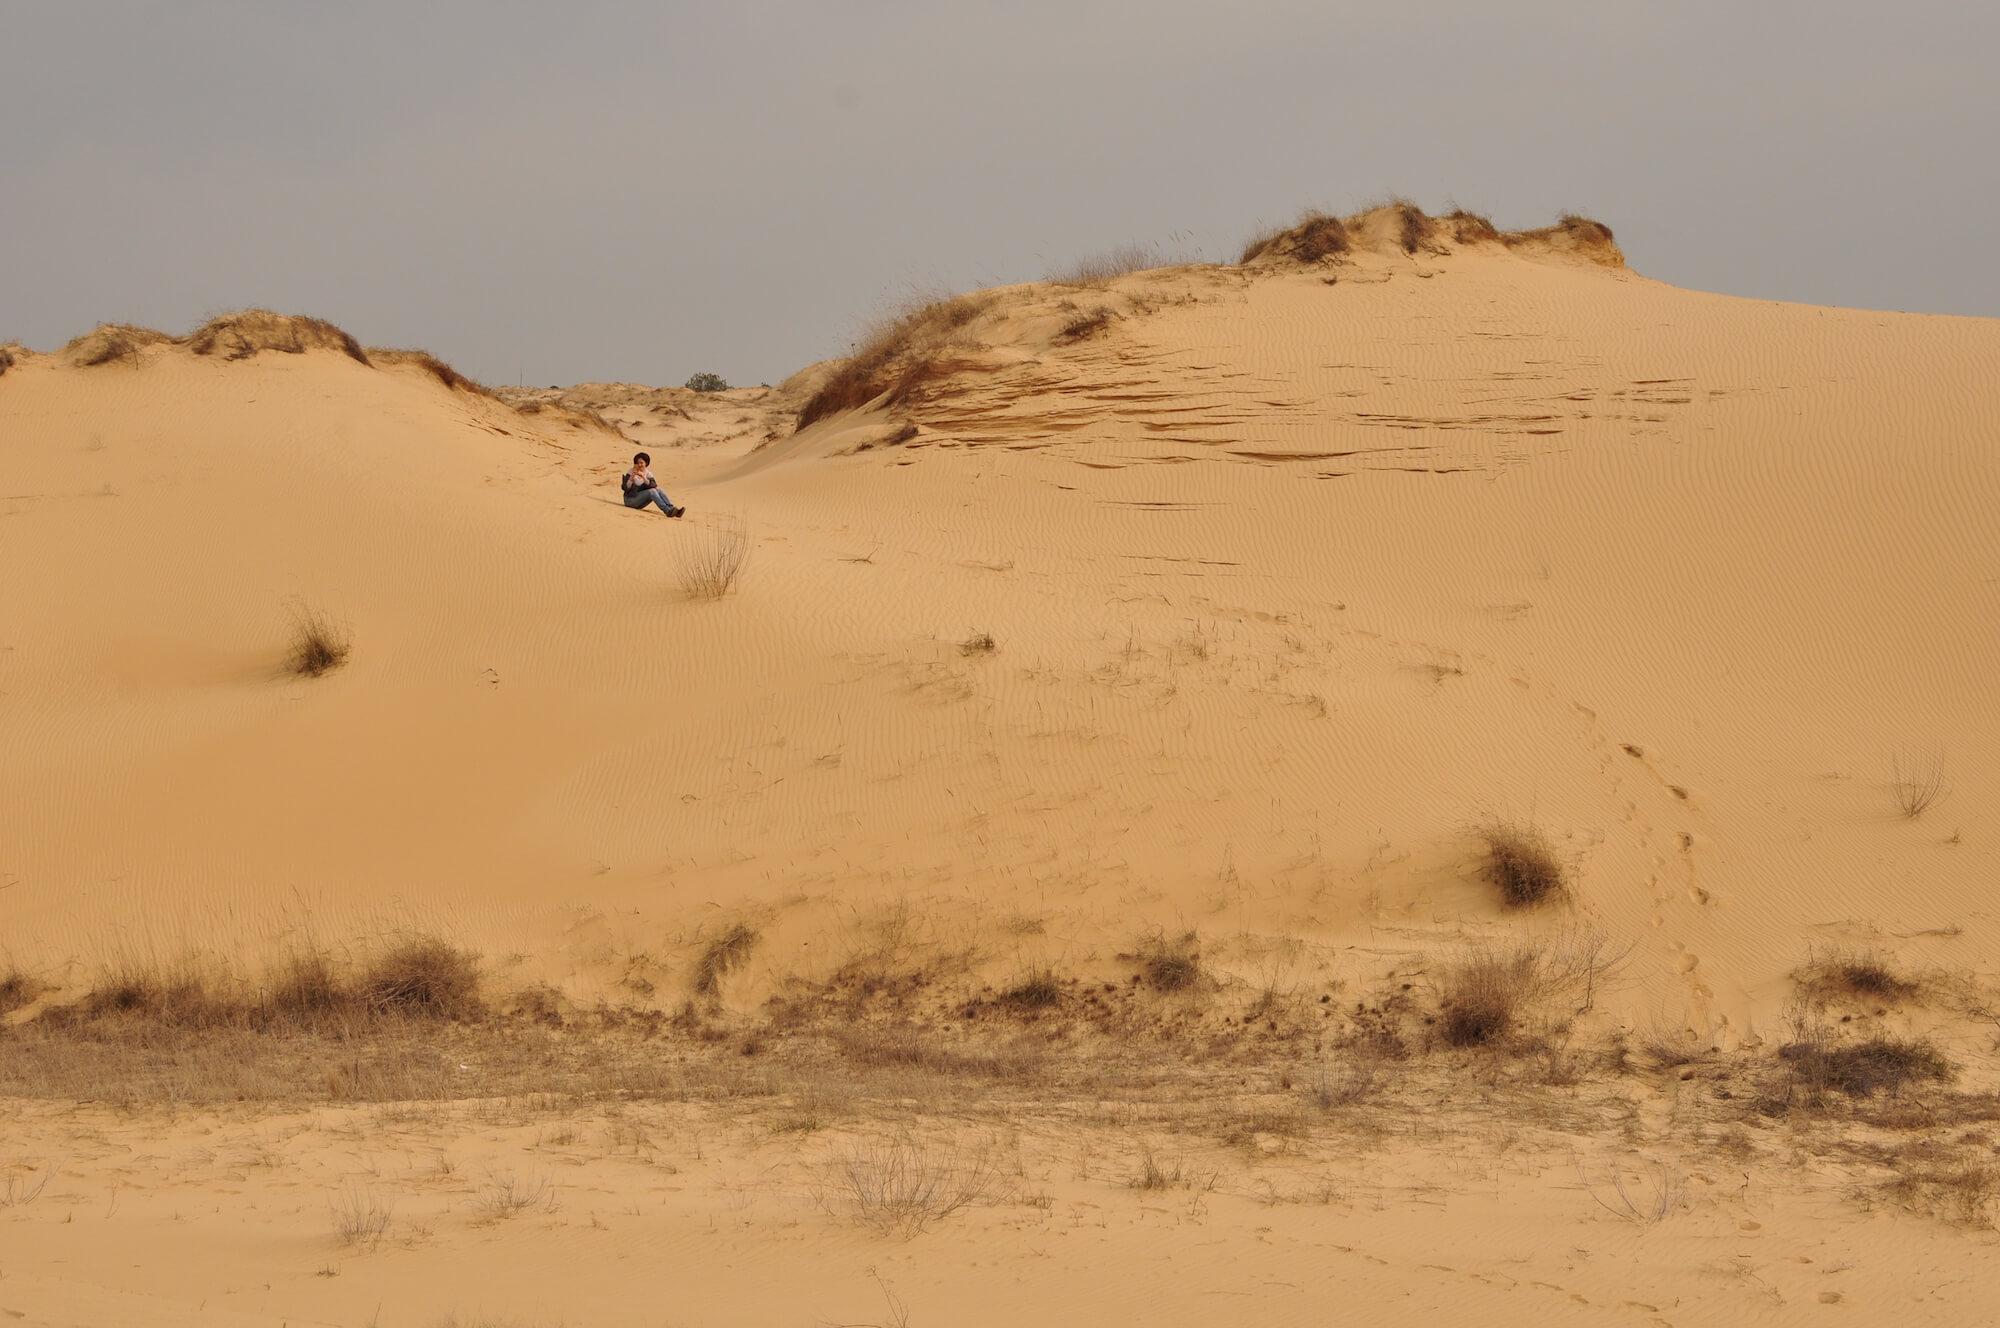 Алешковские пески, Алёшковские пески, Олешковские пески, Нижнеднепровские пески